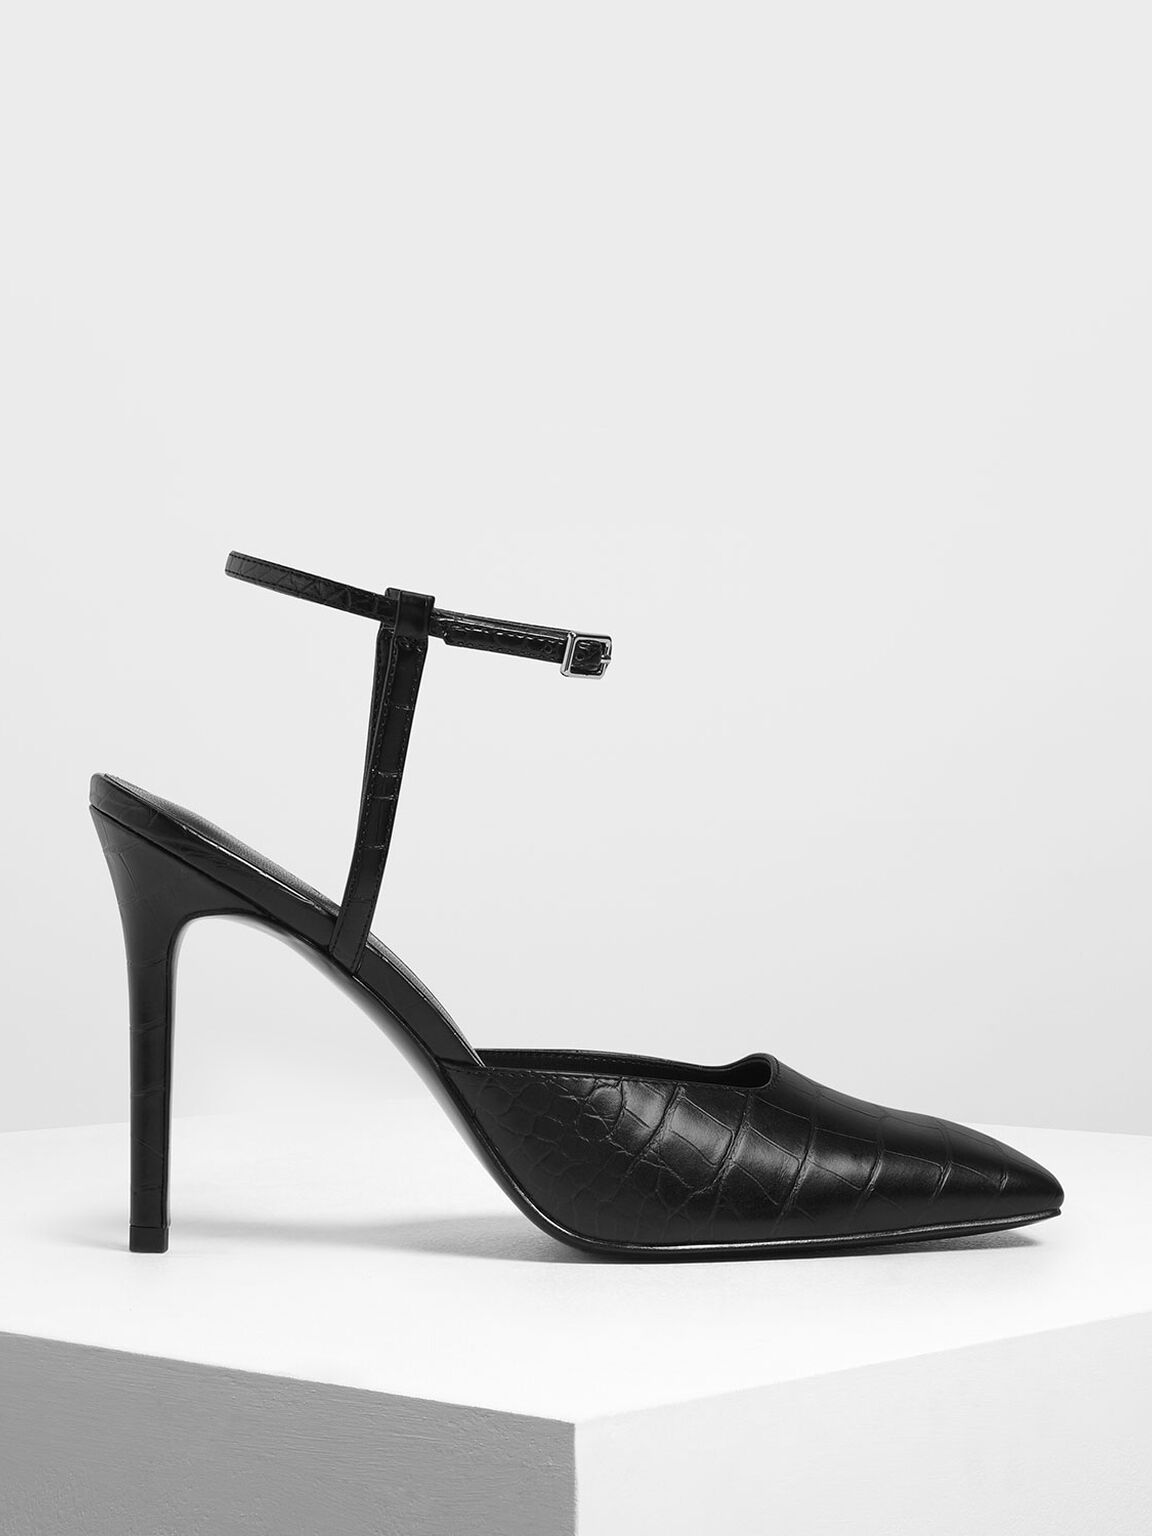 Square Toe Croc-Effect Stiletto Pumps, Black, hi-res